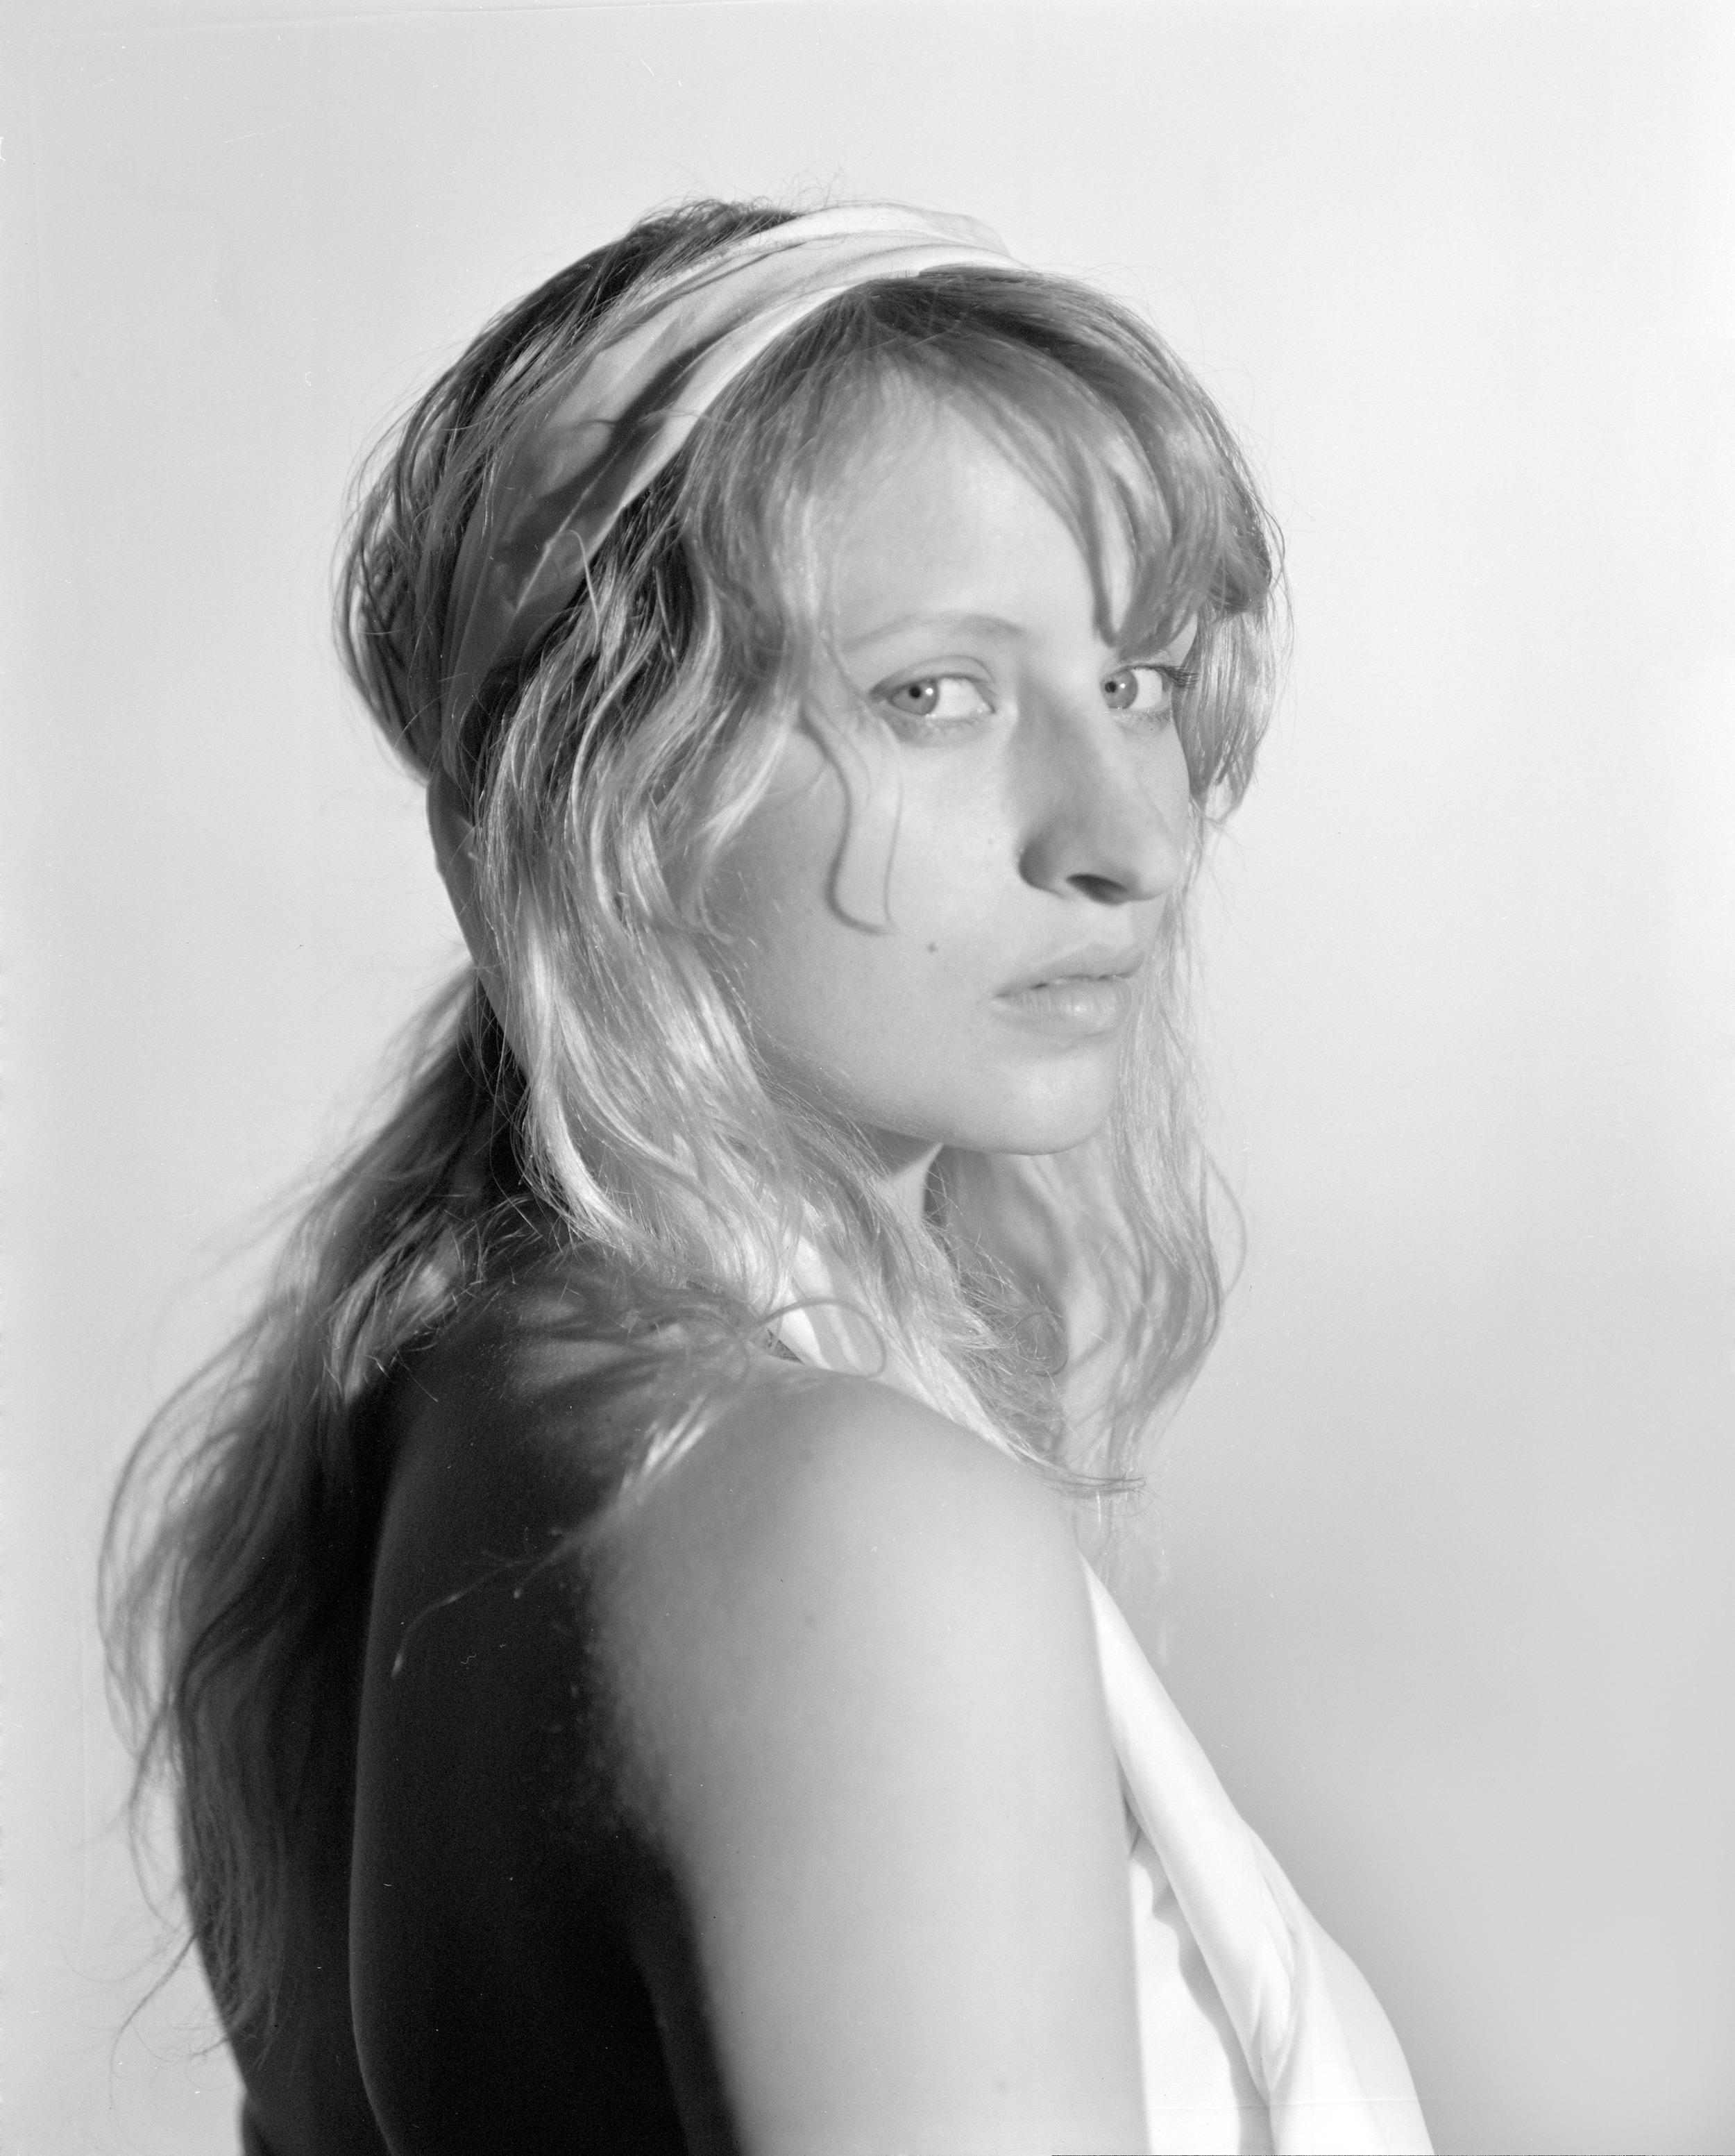 Fine Art Portrait Photographer in Amherst MA